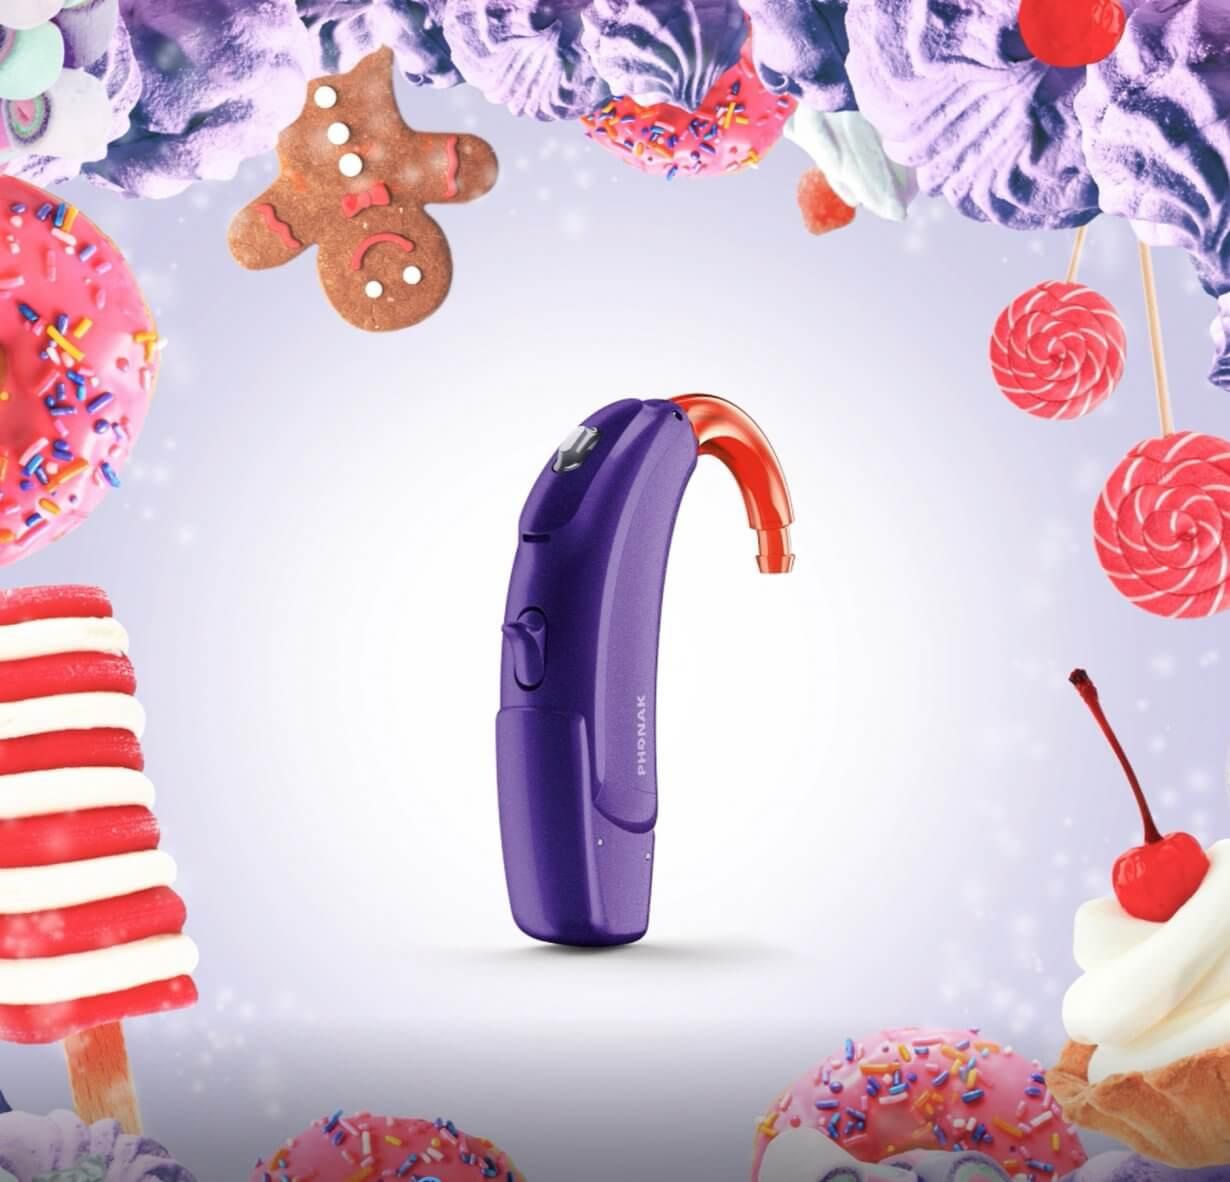 Hörgeräte für Kinder produkte